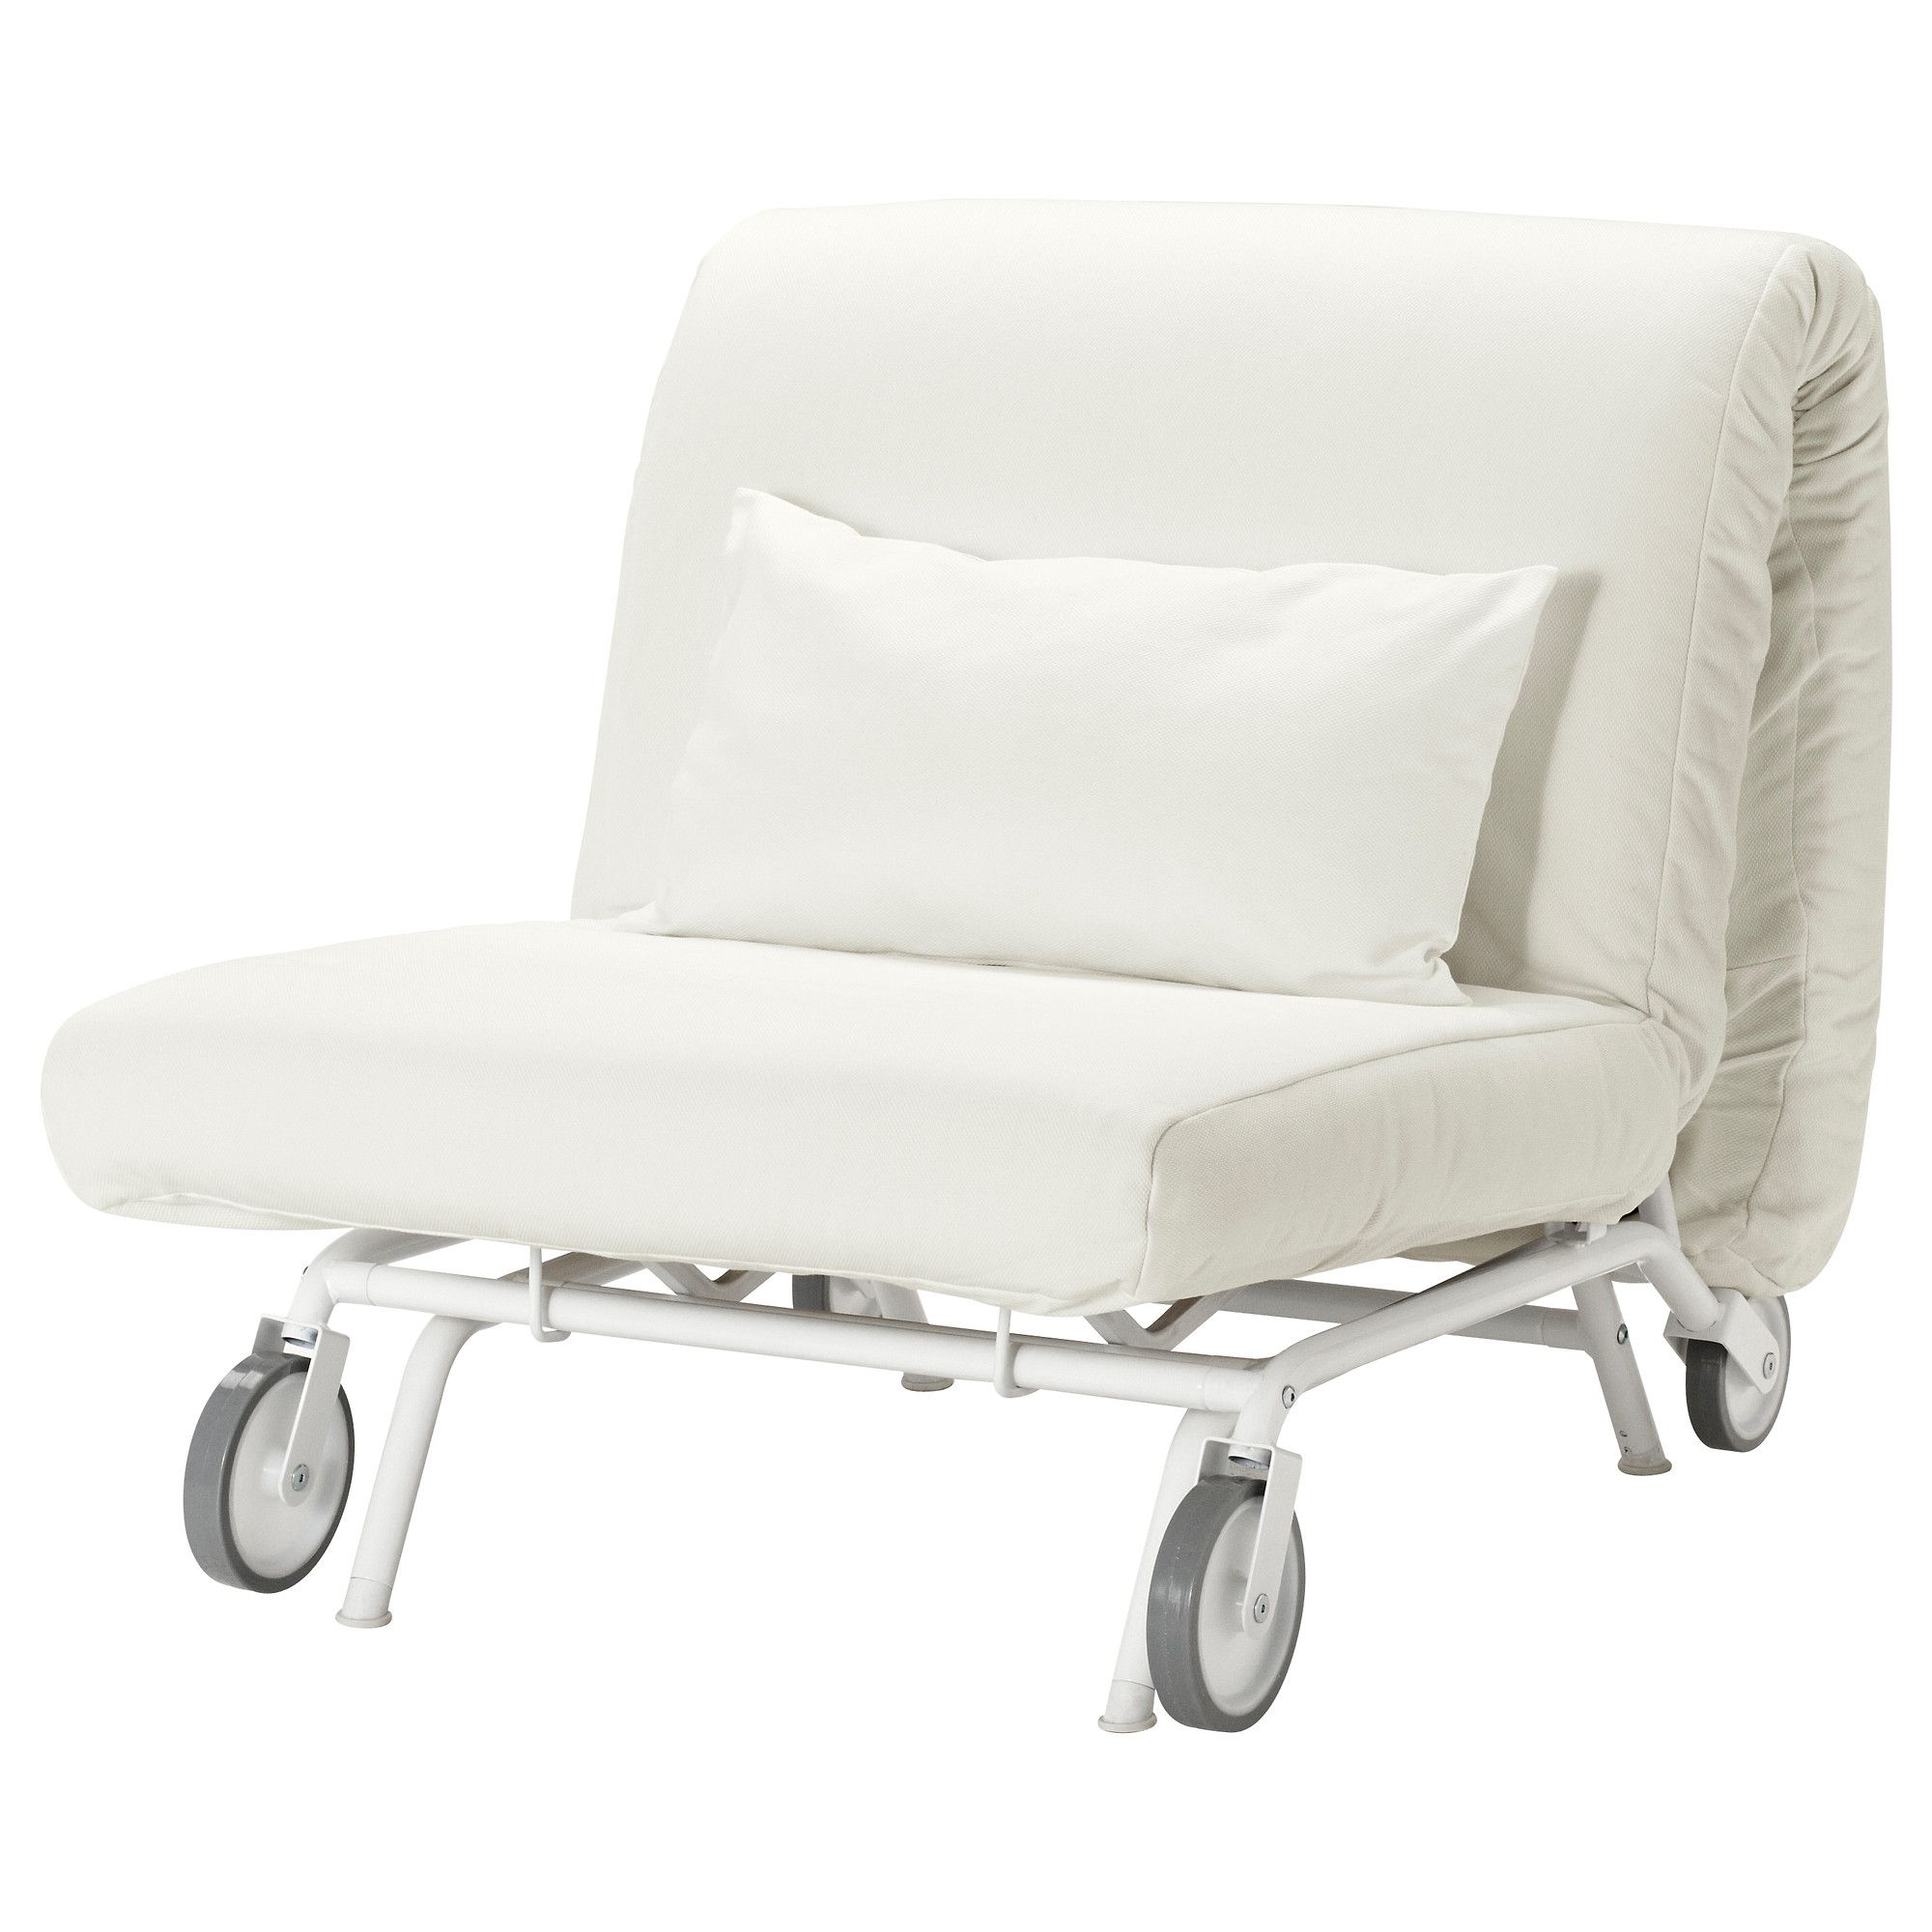 Ikea Us Furniture And Home Furnishings Chair Bed Ikea Ikea